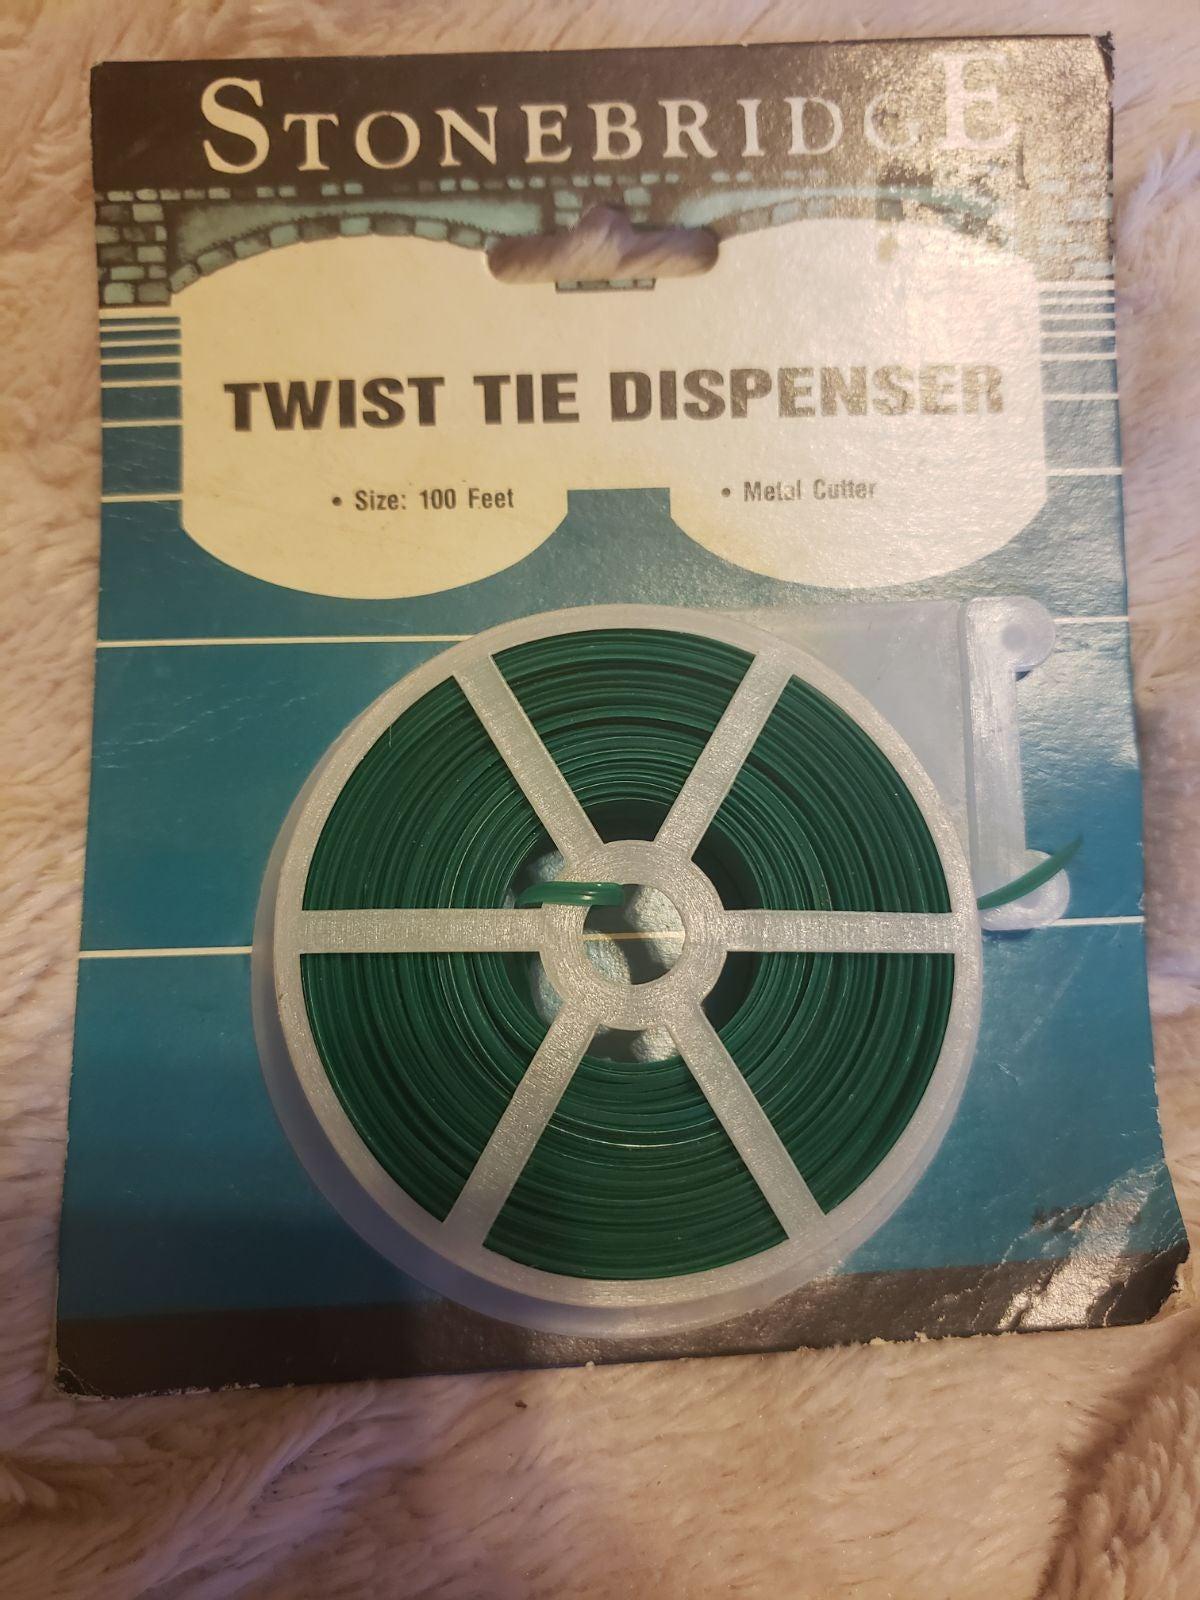 Stonebridge Twist Tie dispenser